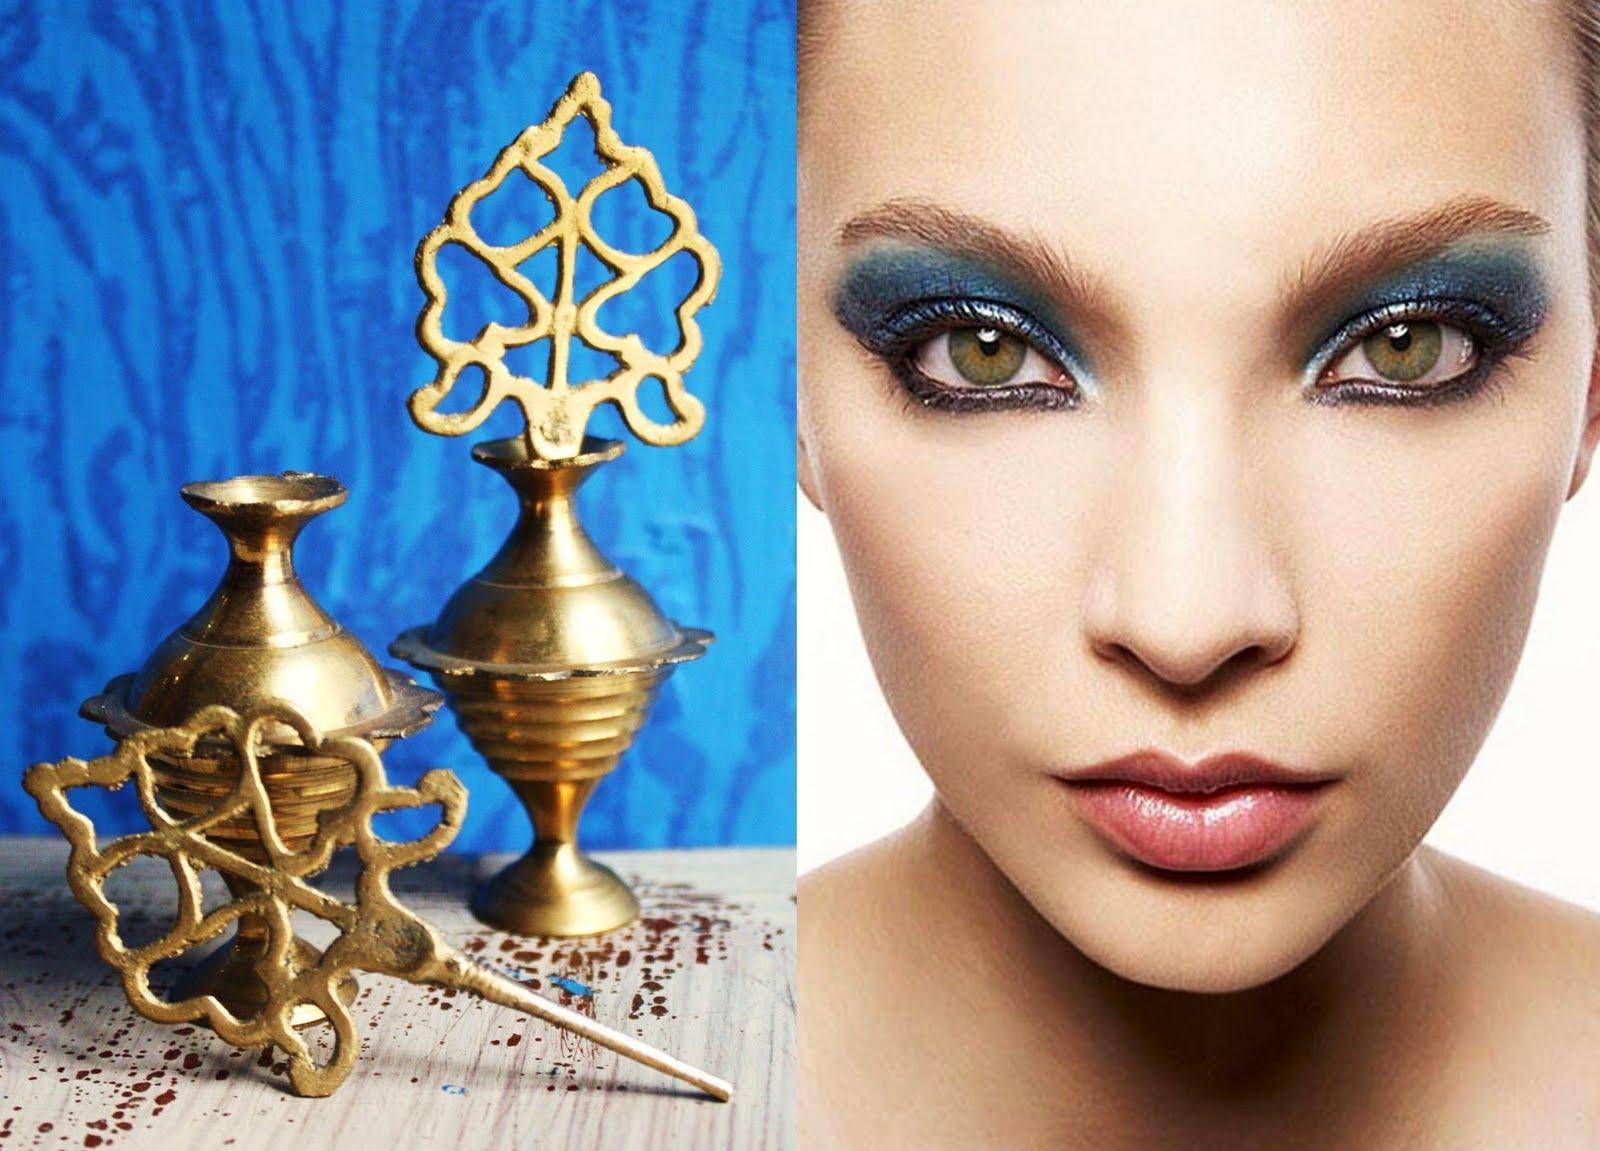 Egyptian kohl